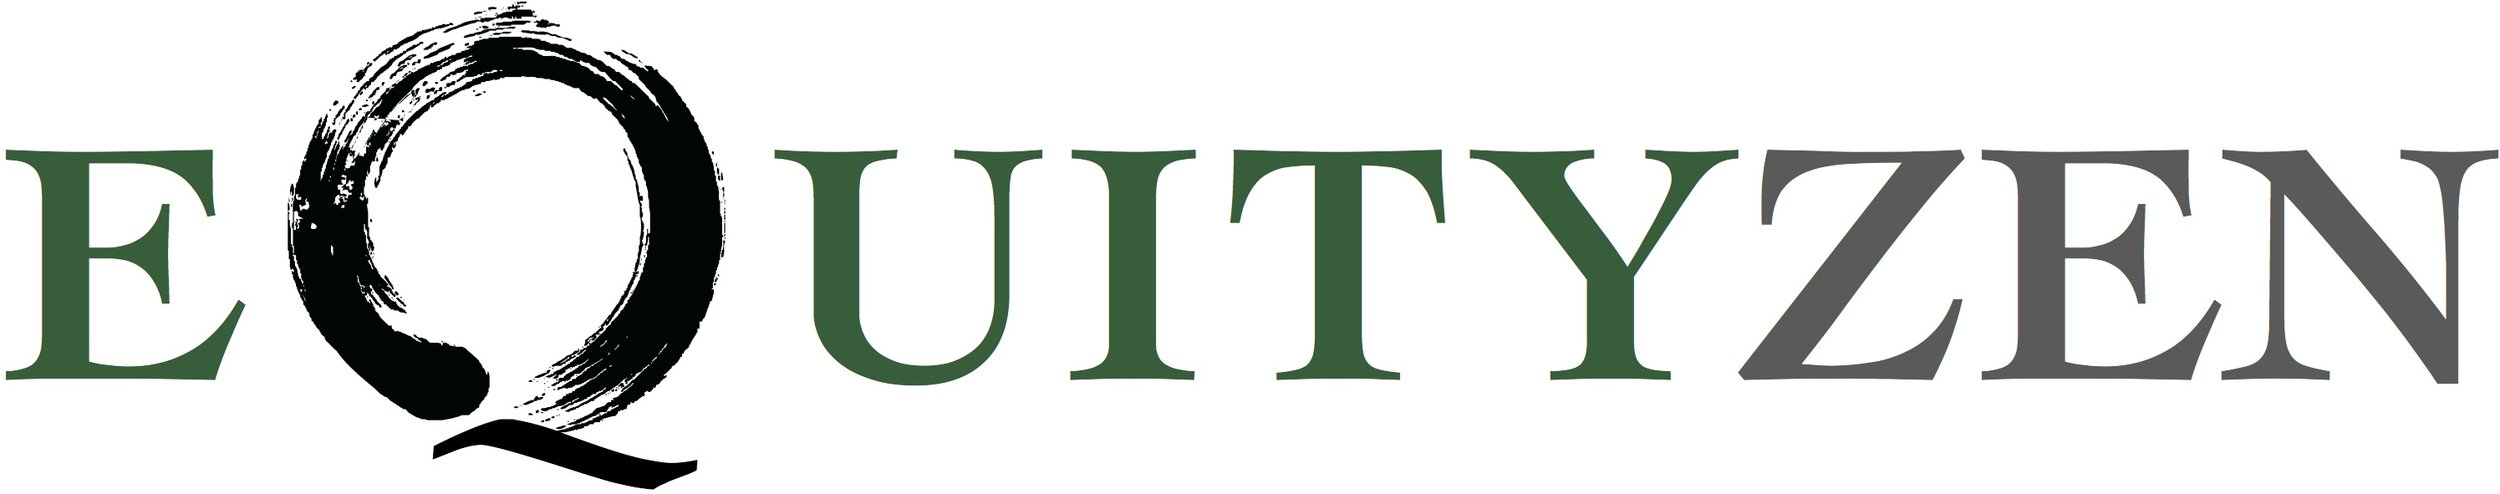 EquityZen_logo_TechGC.jpg